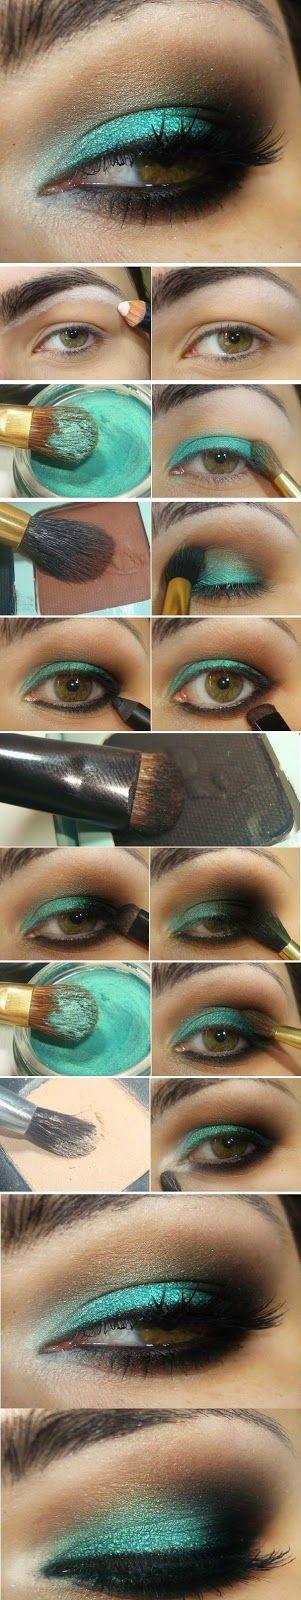 Emerlad Green Shade # Makeup Tutorials # Step by Step / Best LoLus Makeup Fashion